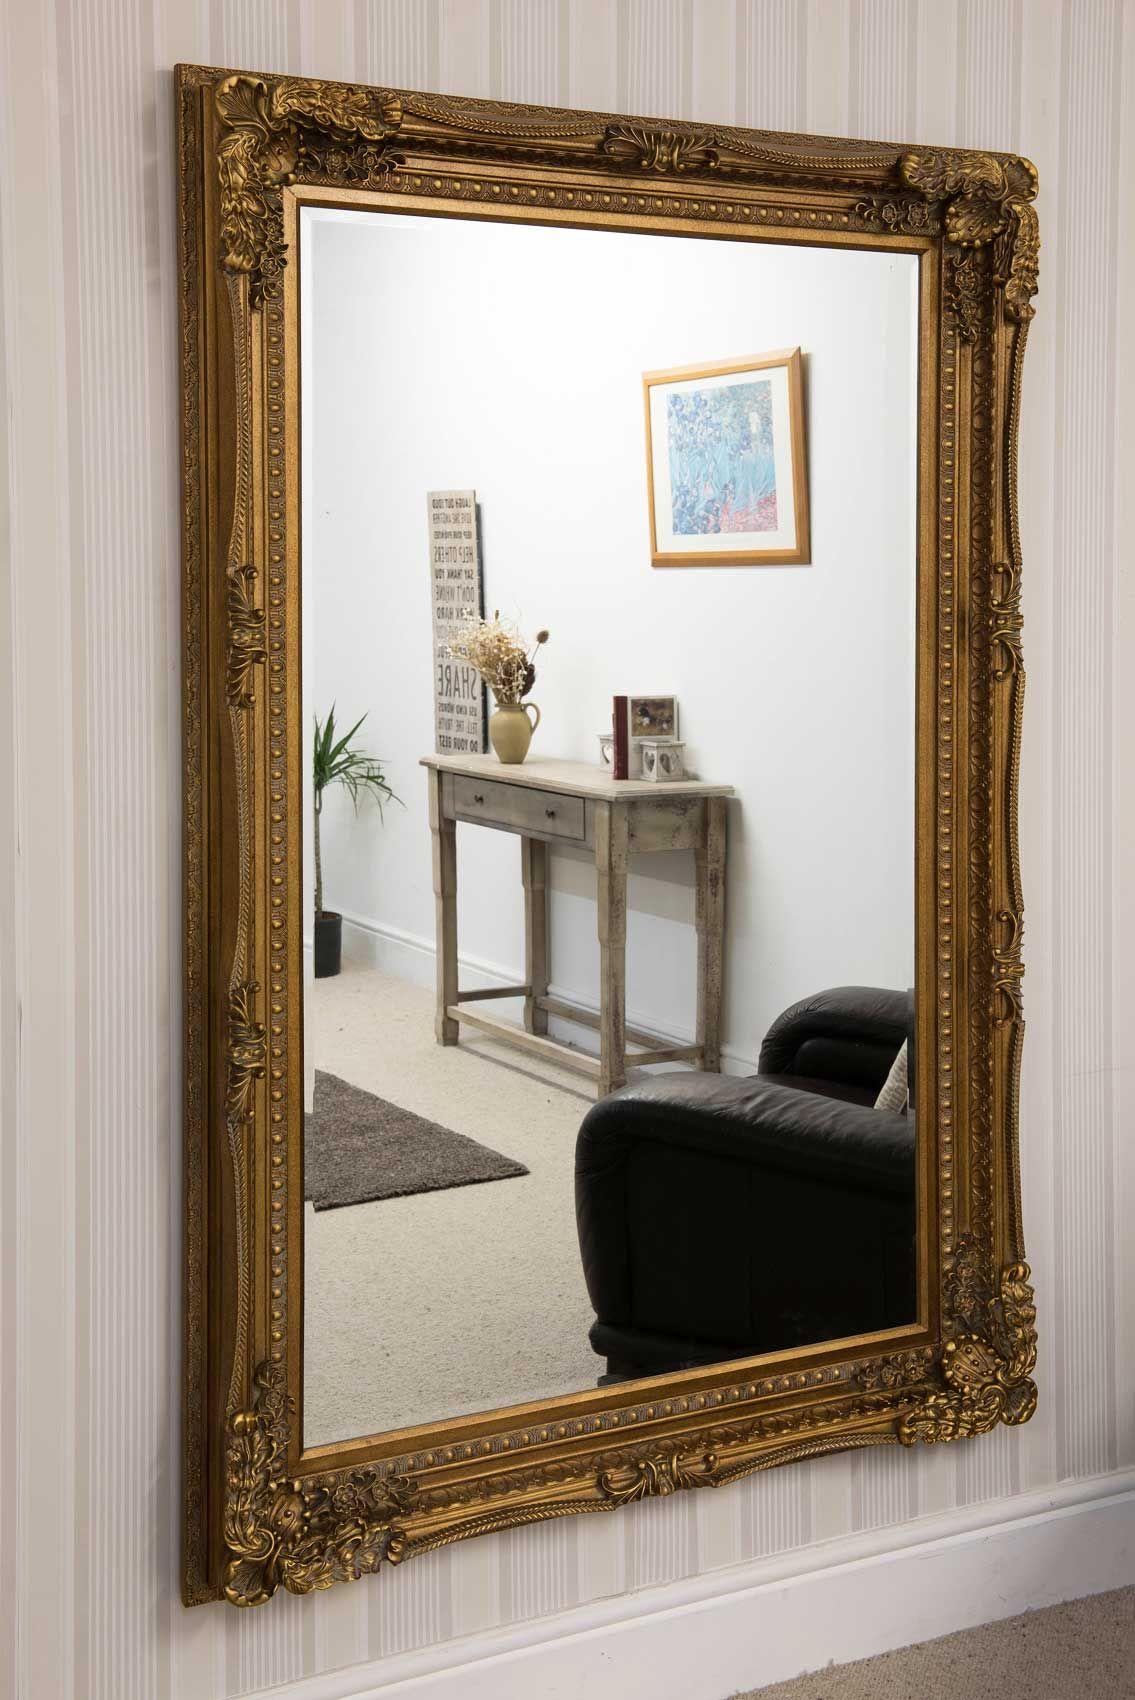 Charlton Gold Framed Mirror 123x175cm Gold framed mirror